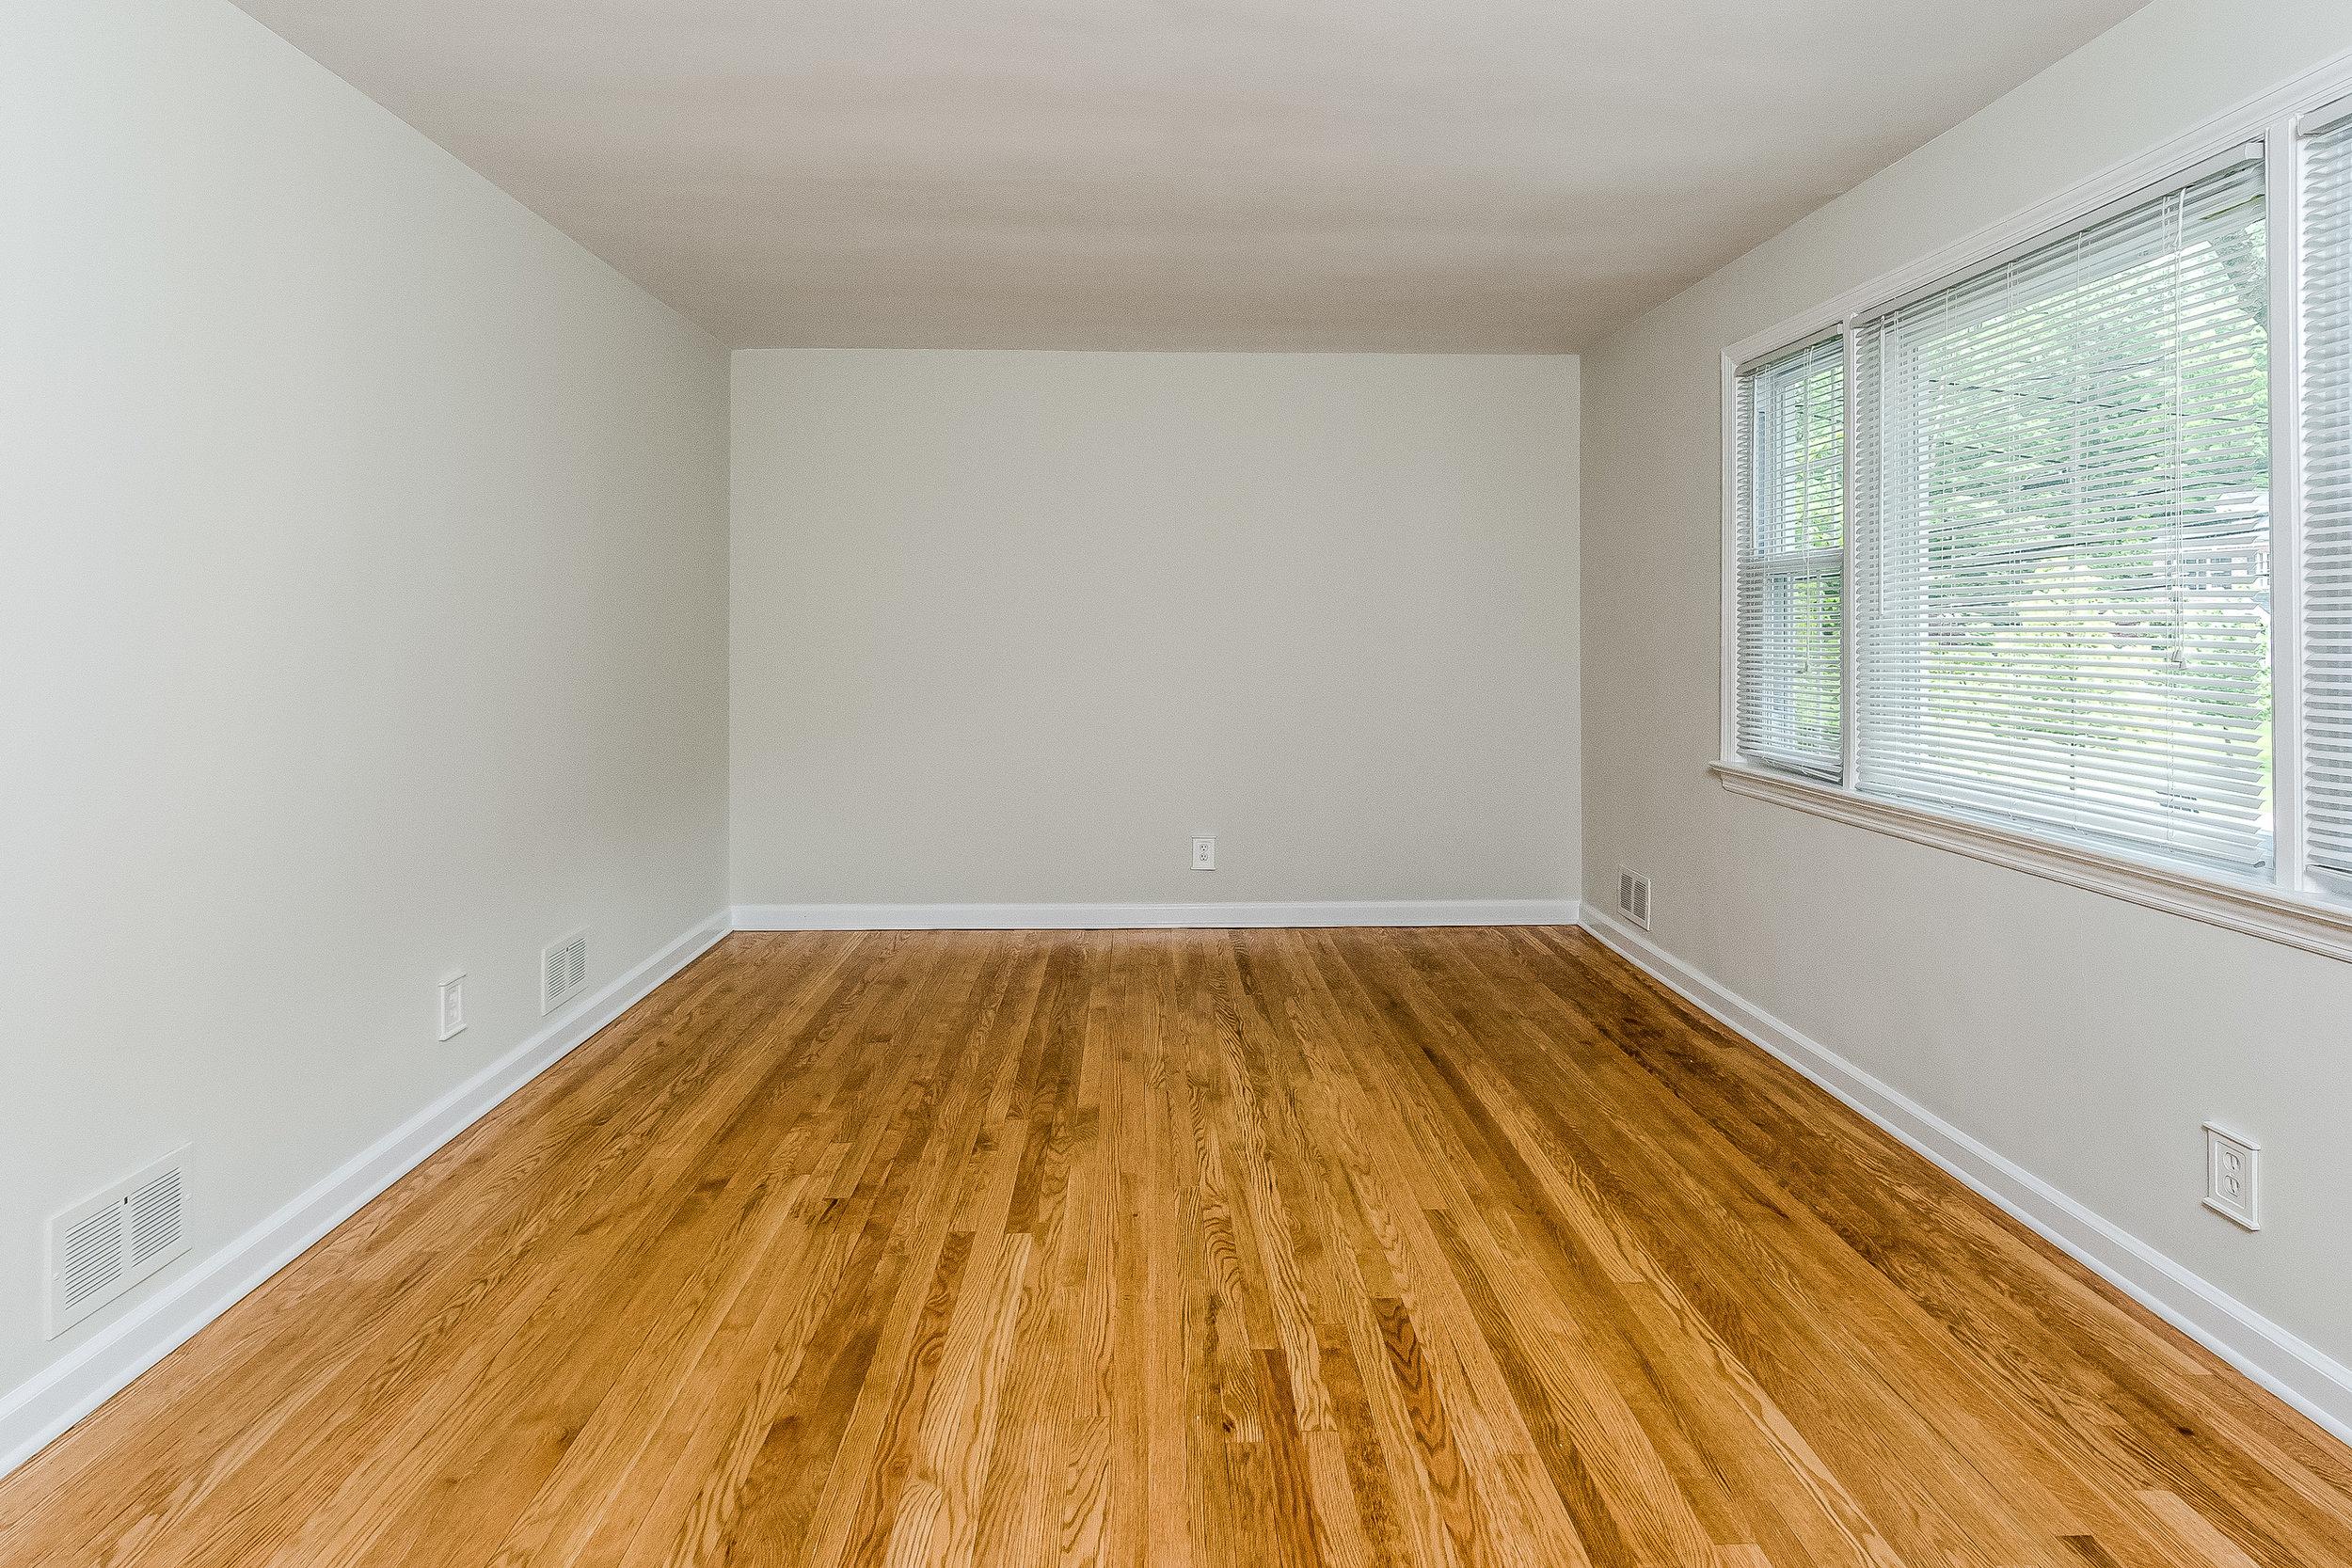 006-photo-living-room-5786545.jpg